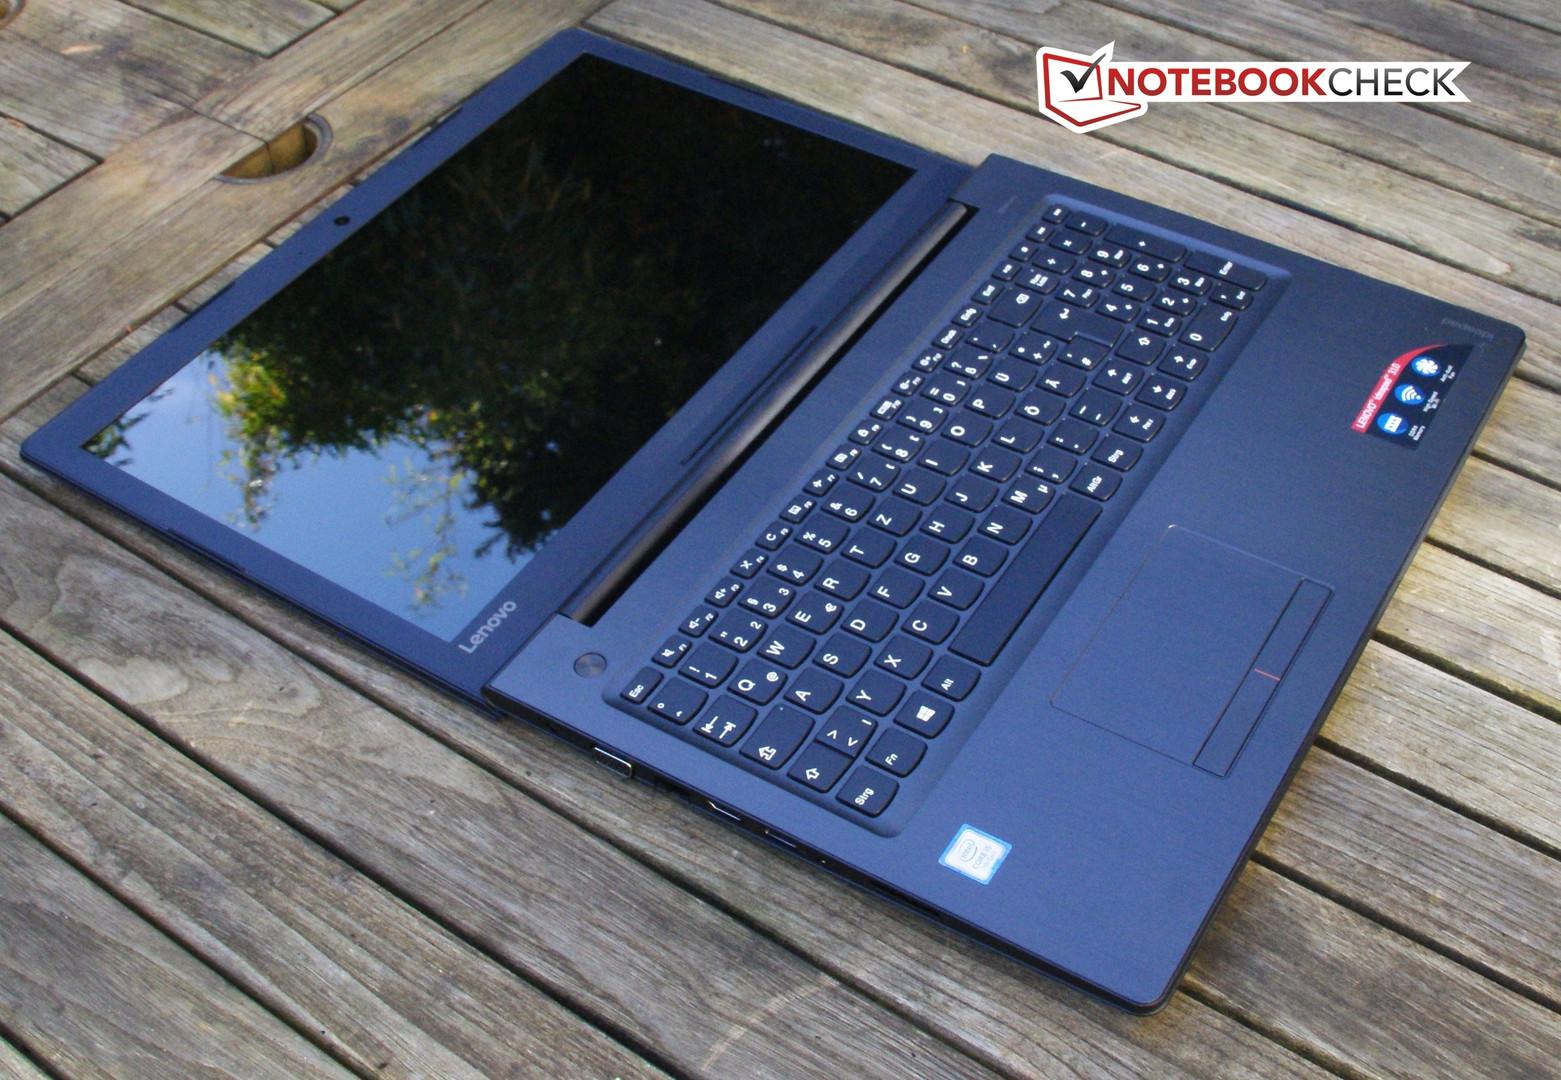 Lenovo Ideapad 310 15ikb Notebook Review Reviews Ideapad110 Black Texture Intel N3160 2gb Ram 1tb Dos Max Opening Angle